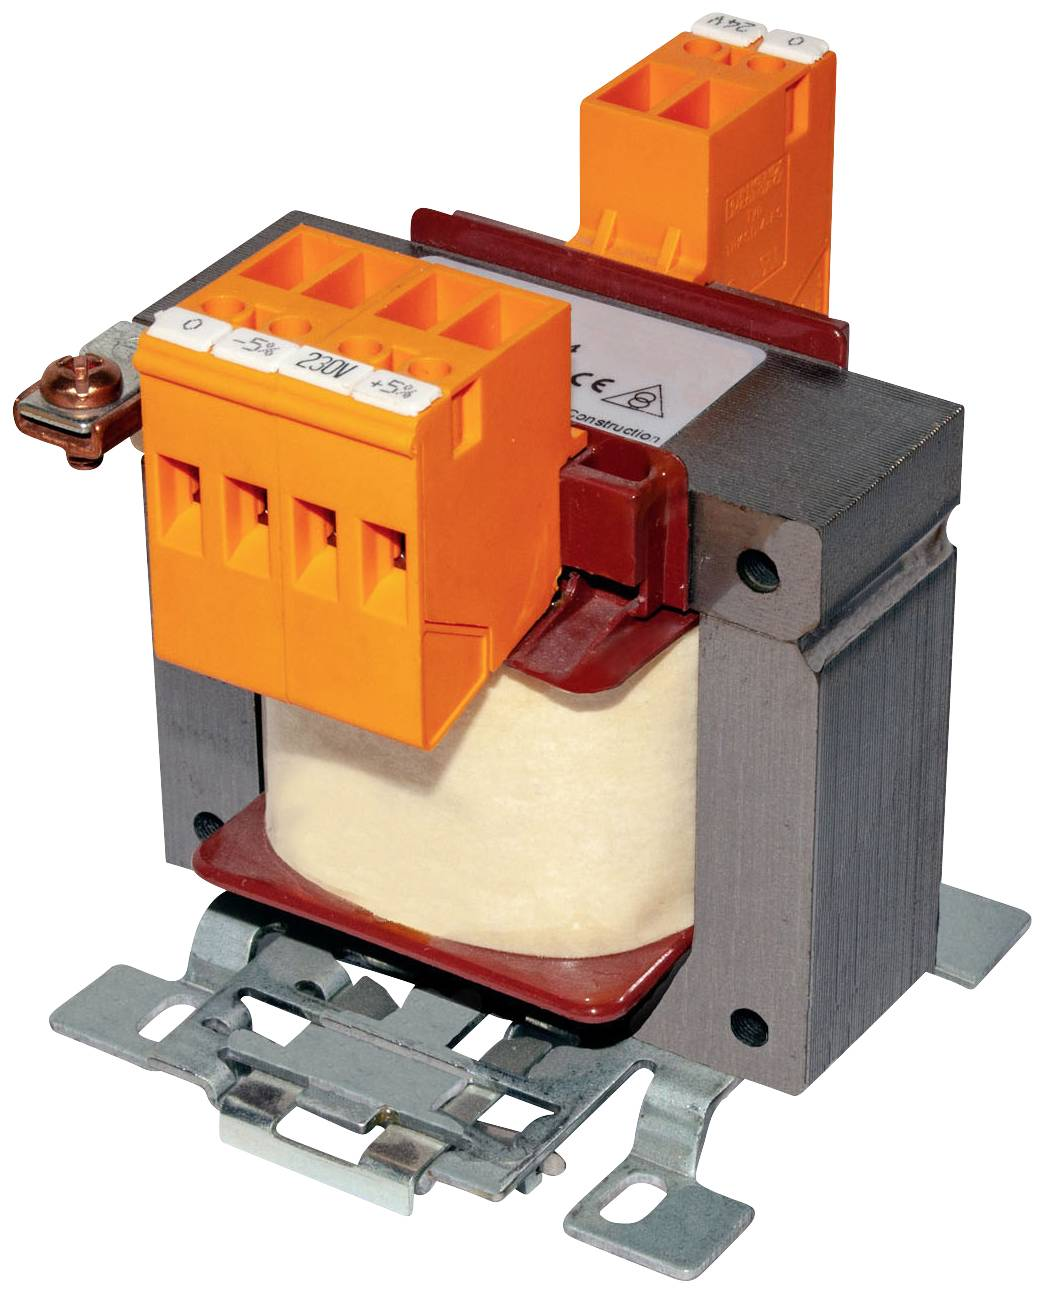 Riadiaci transformátor Weiss Elektrotechnik WUSTTR 63/21230, 63 VA